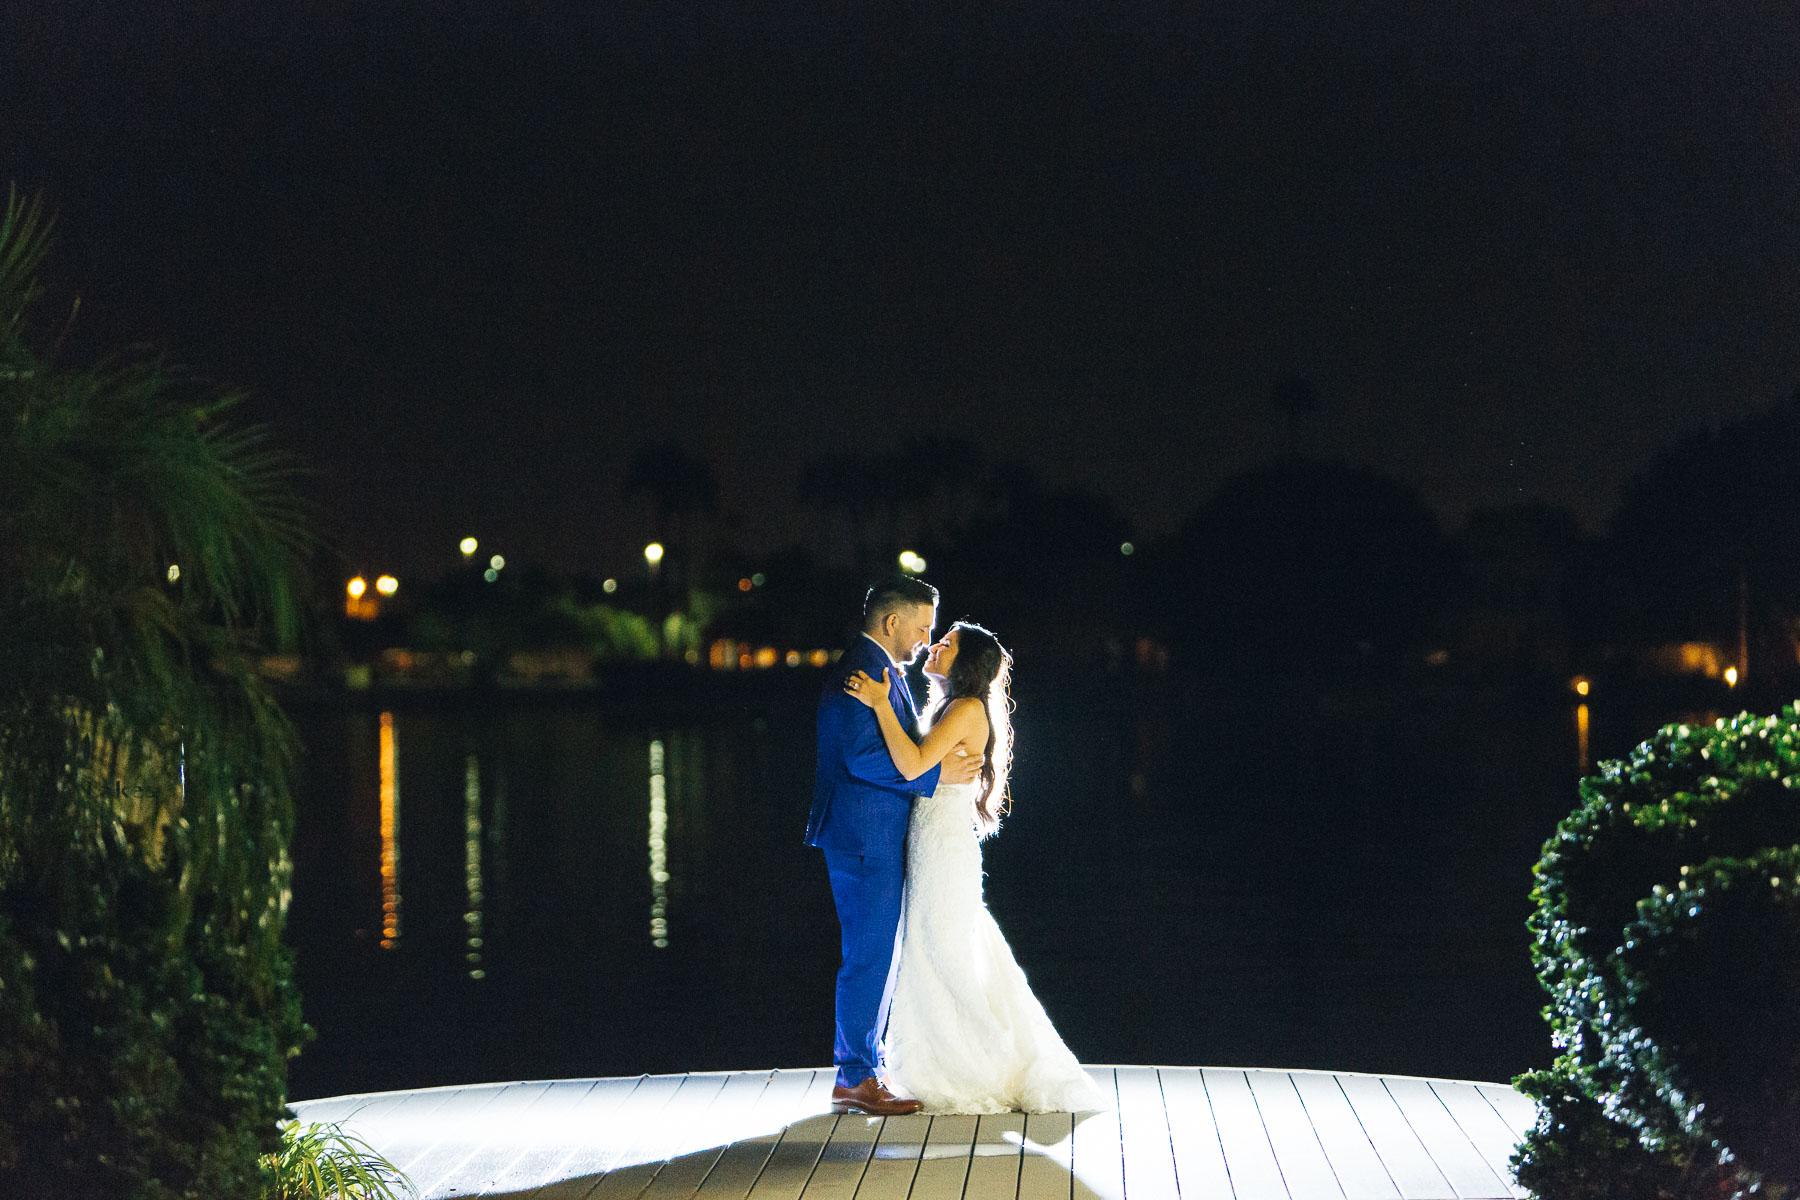 161029-Luxium-Weddings-Arizona-Jeff-Griselda-First-Look-Val-Vista-Lakes-Gilber-087.jpg